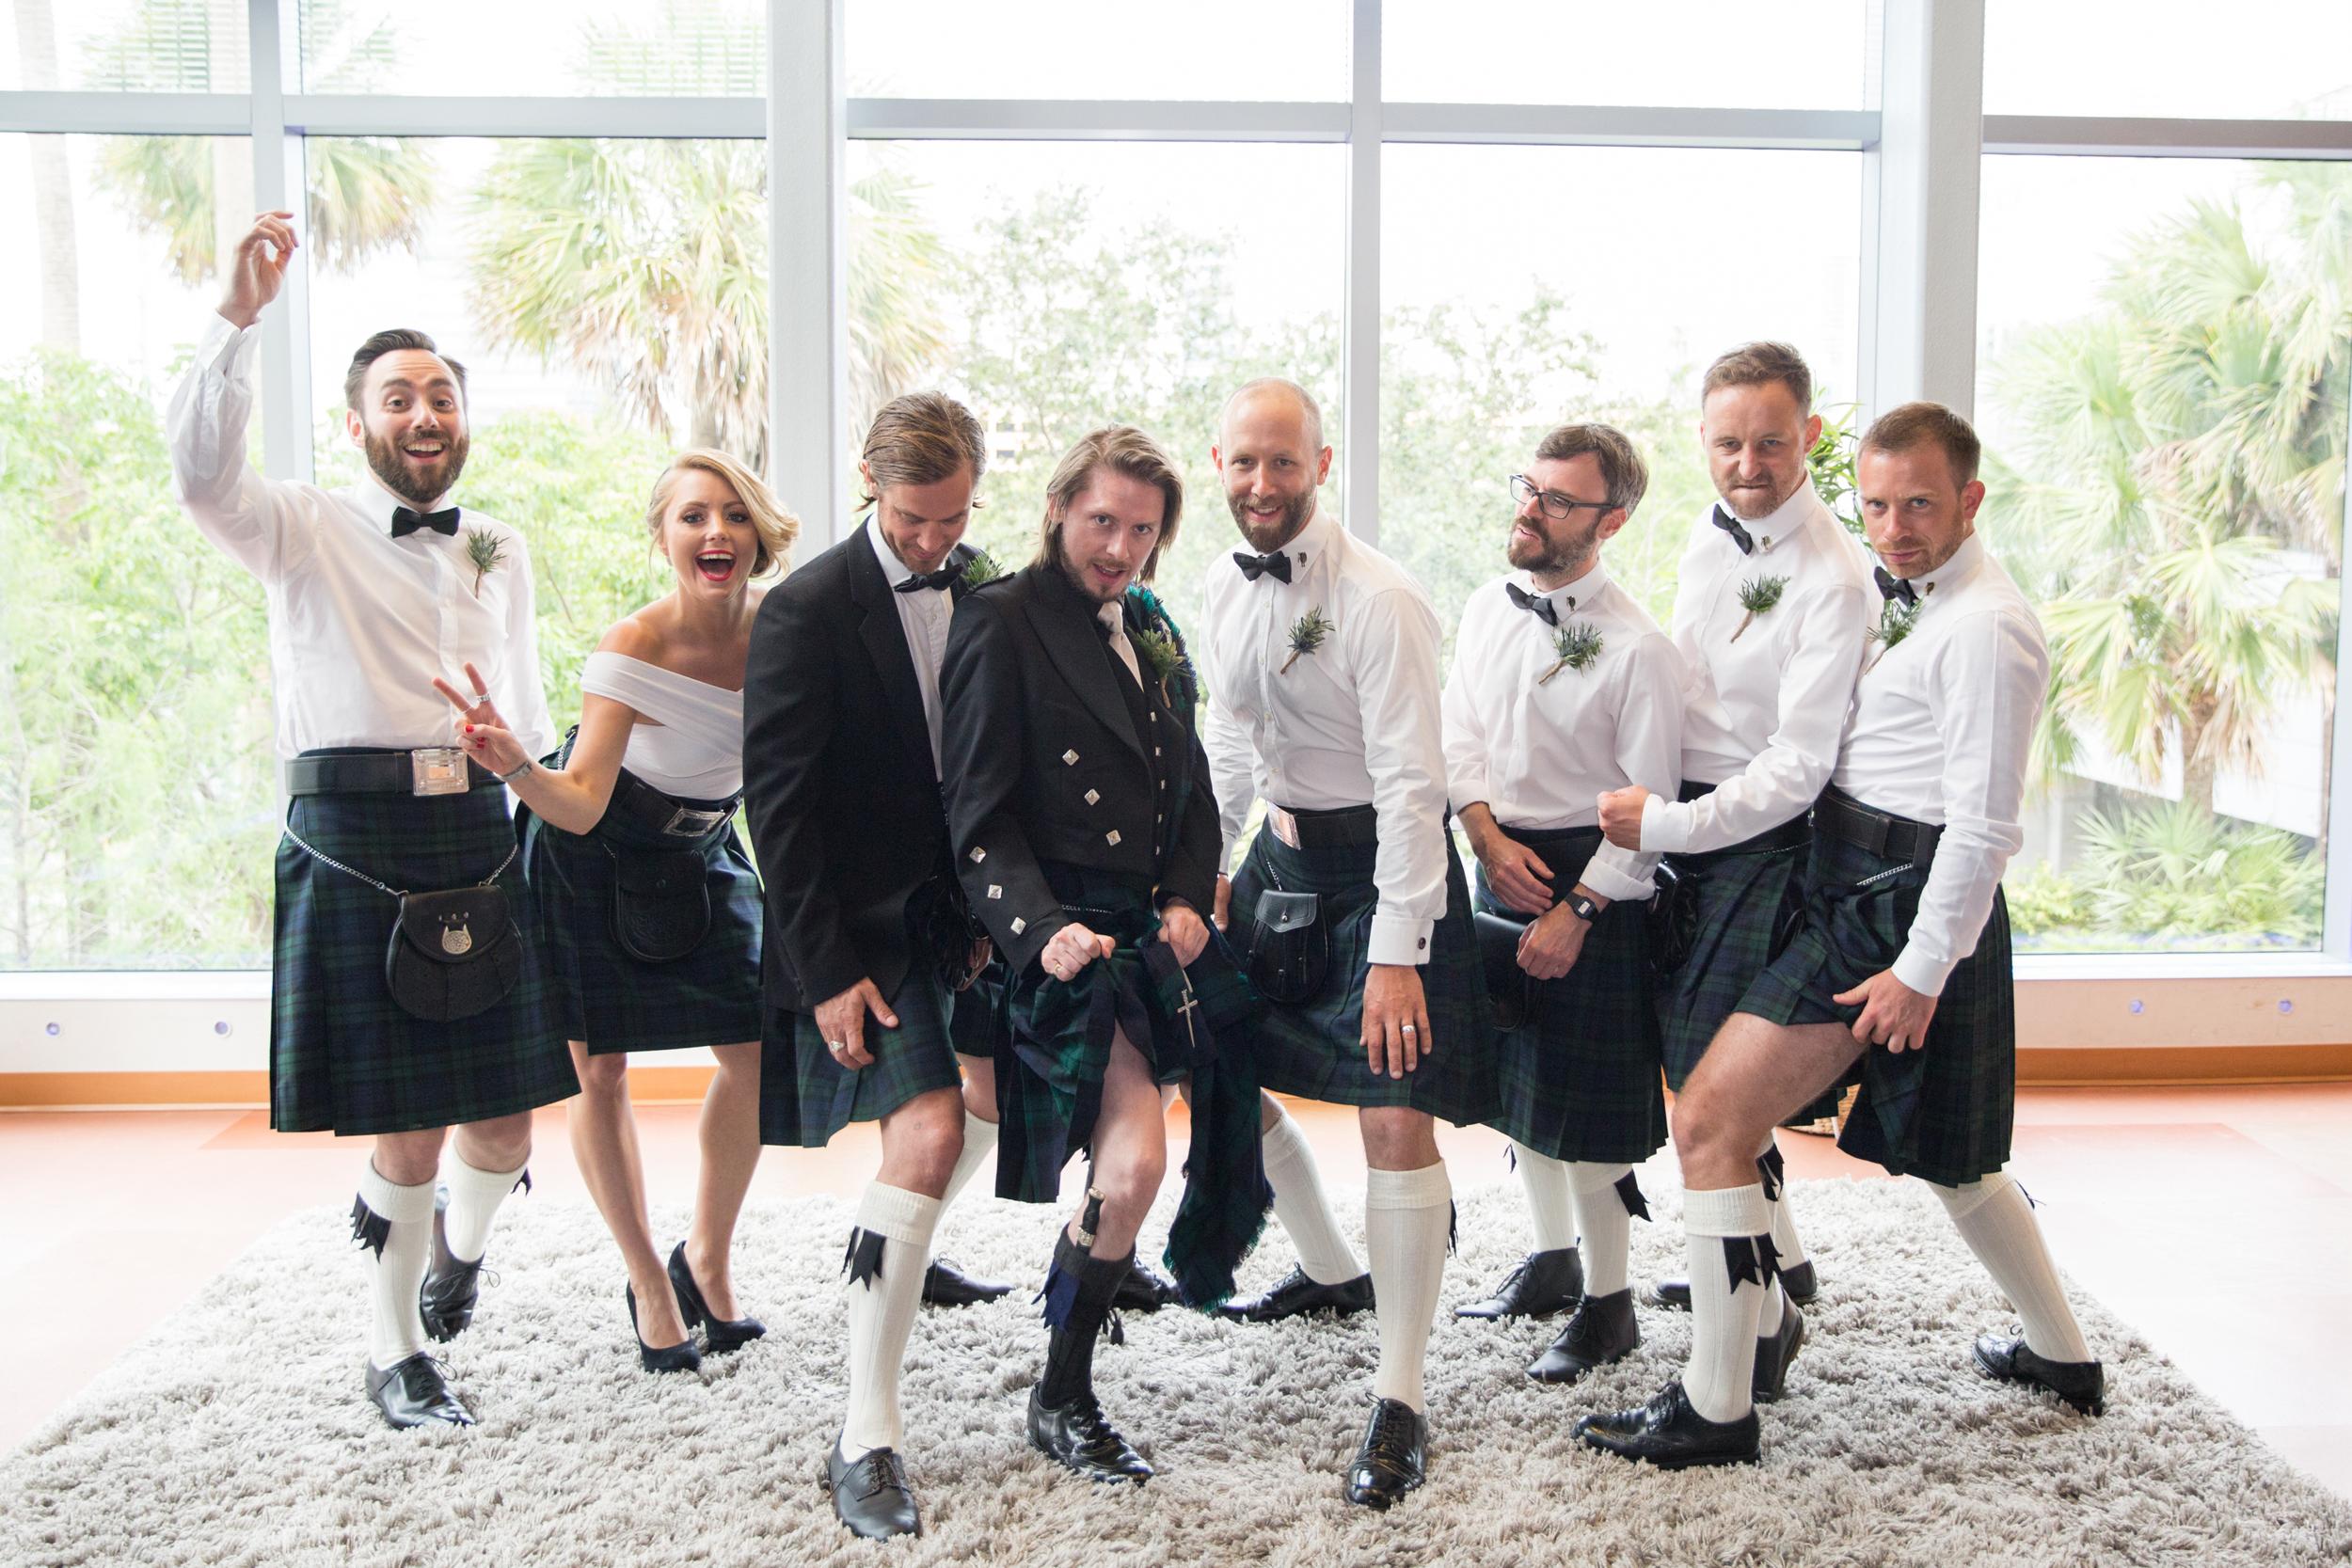 WEB_6-18-17_MindyChris_Wedding-170.jpg